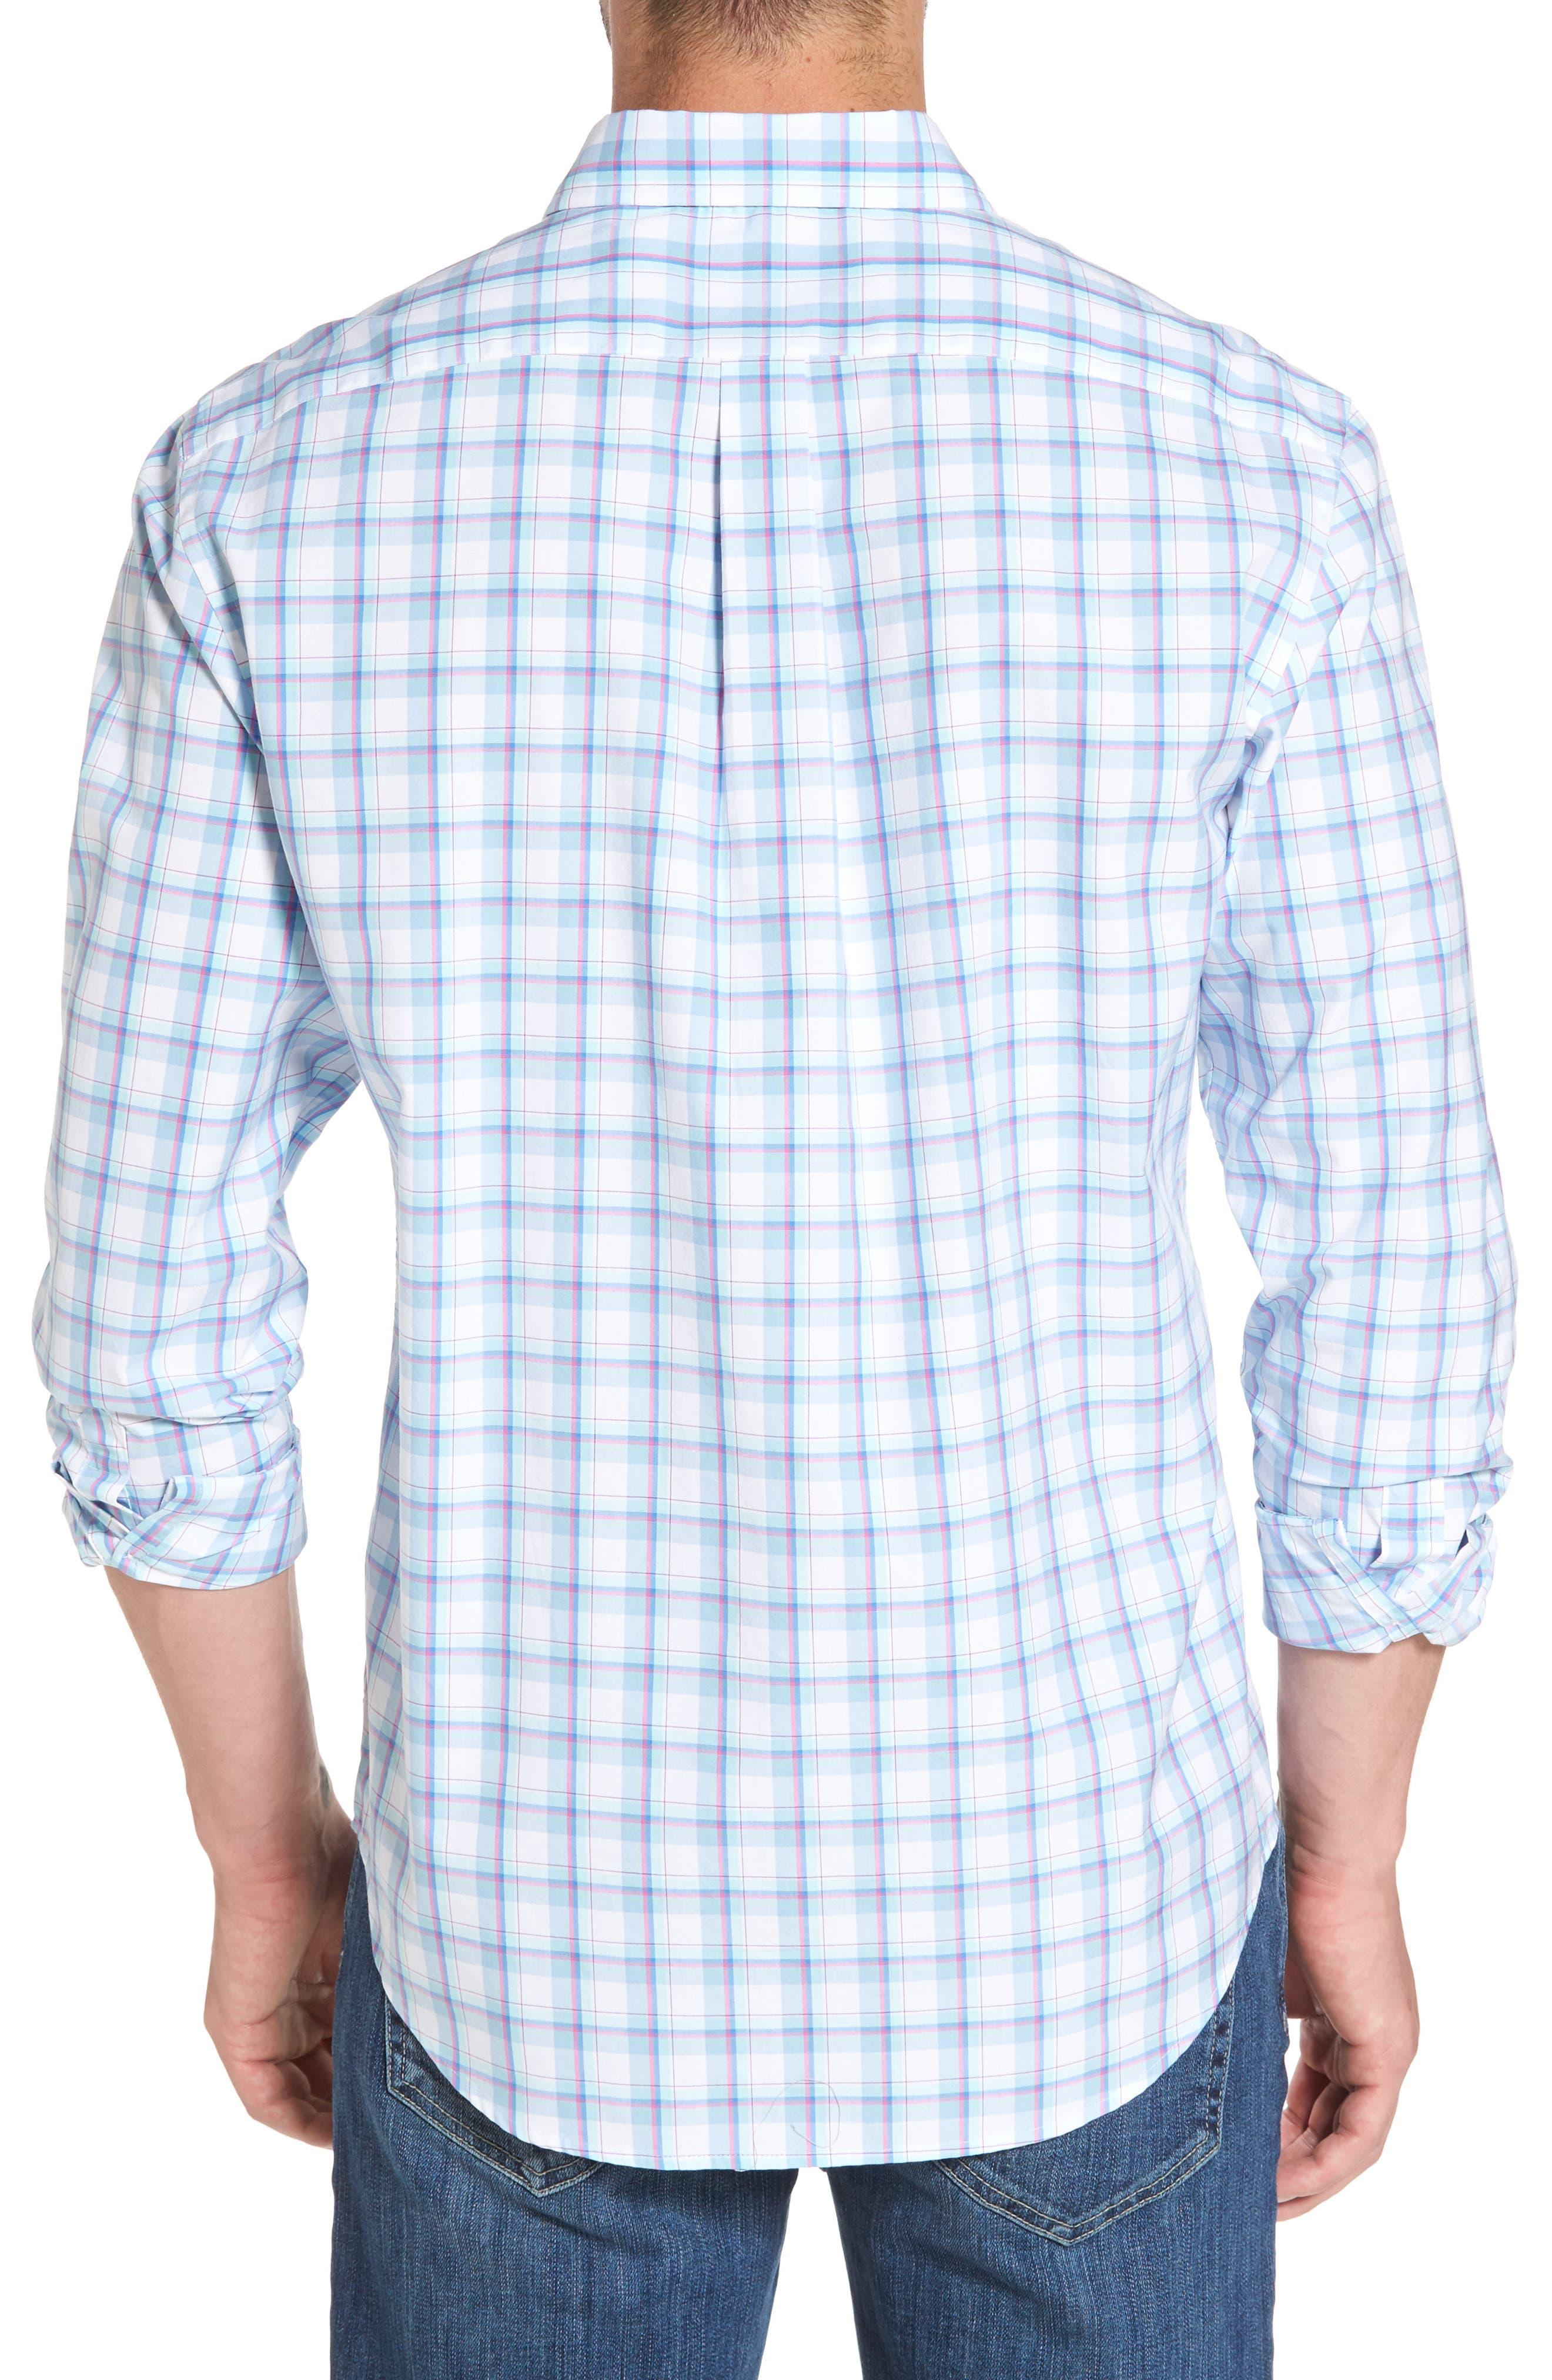 Plaid Classic Fit Sport Shirt,                             Alternate thumbnail 2, color,                             Jake Blue